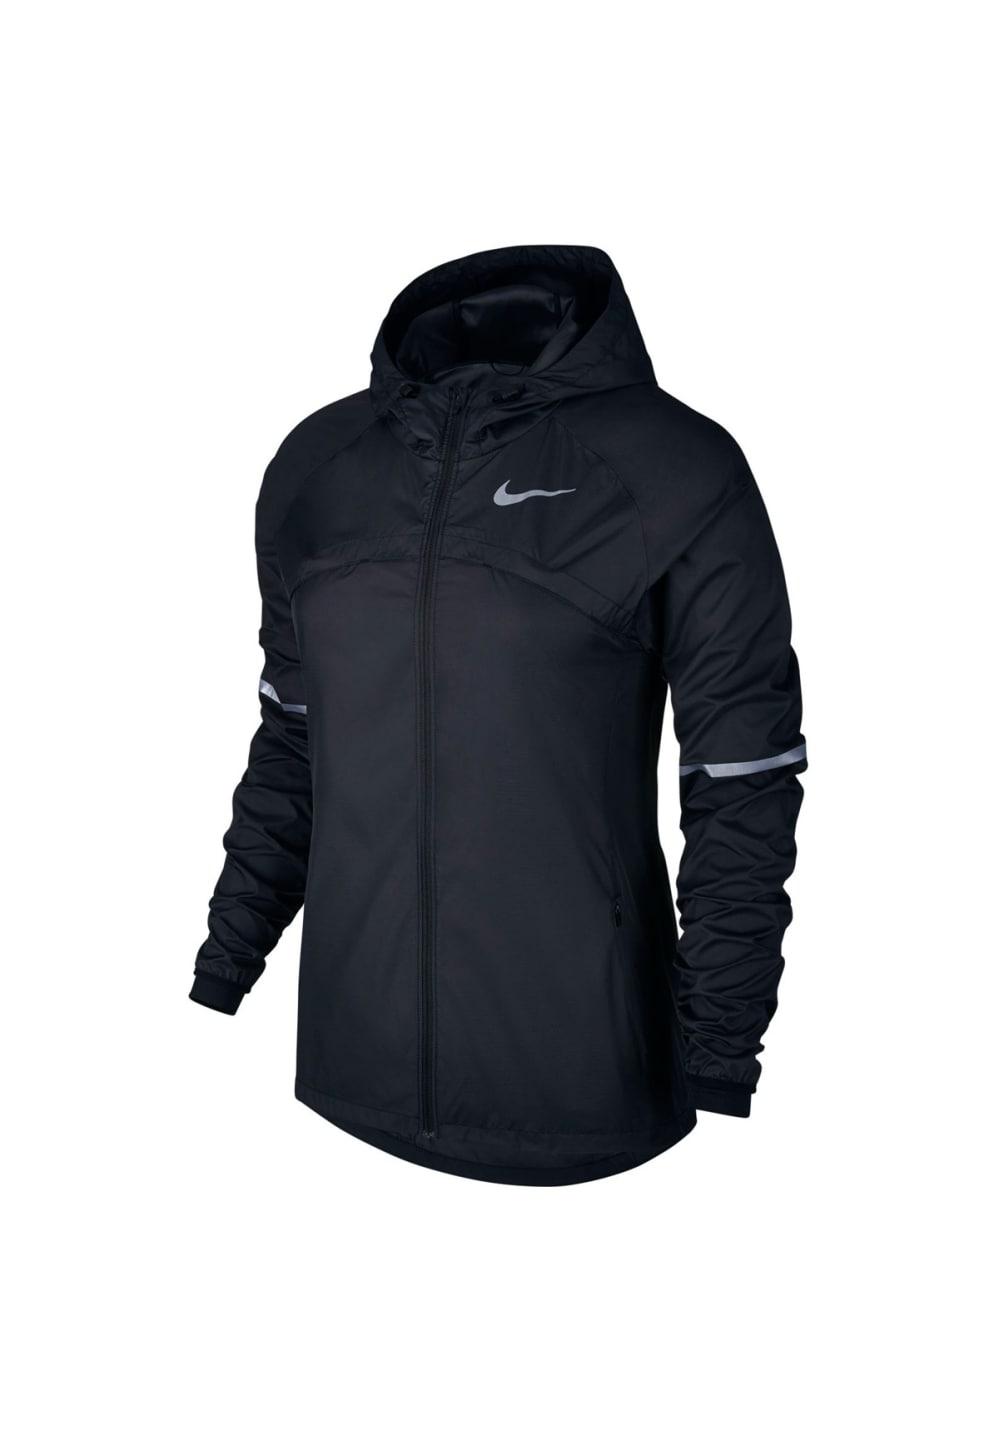 Nike Shield Hooded Running Jacket - Laufjacken für Damen - Schwarz, Gr. XS